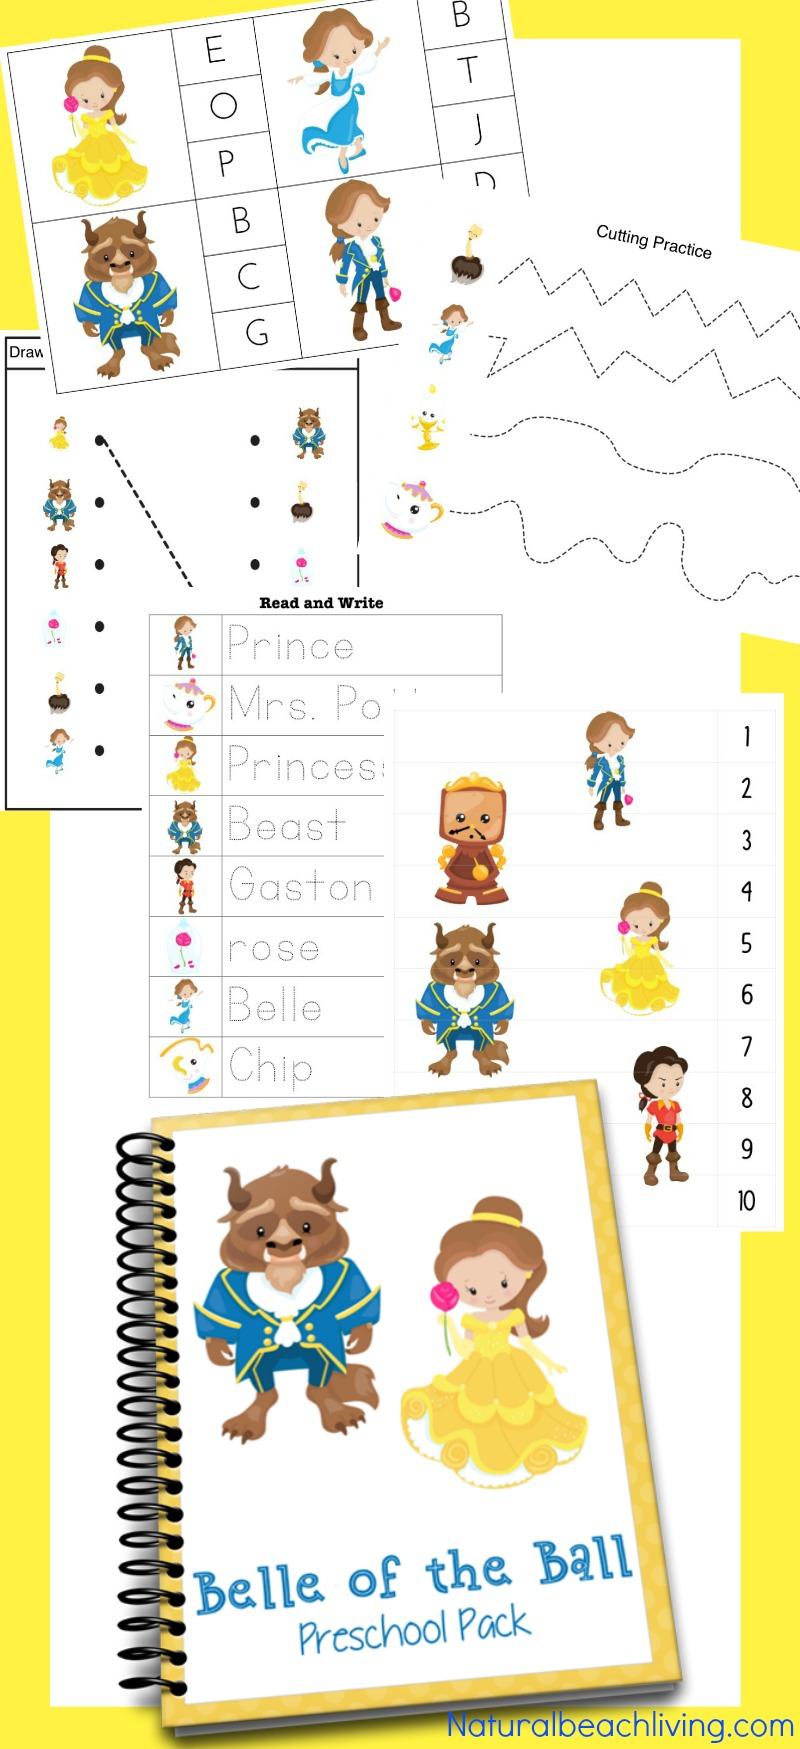 Beauty and The Beast Printables for Preschool & Kindergarten